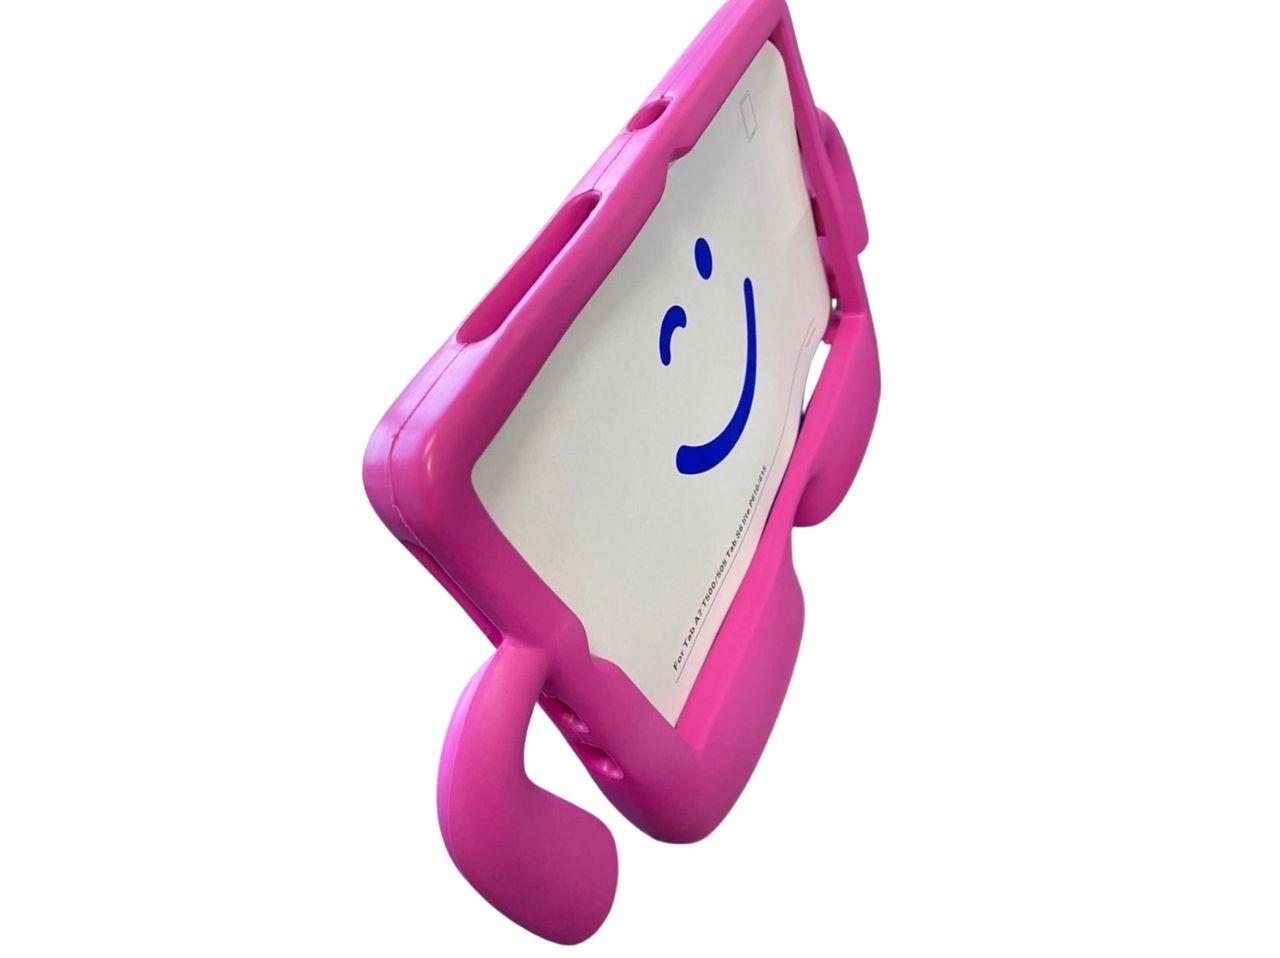 Kit Capa Tablet Samsung Galaxy Tab A7 10.4 T500 T505 Boneco Rosa + Vidro